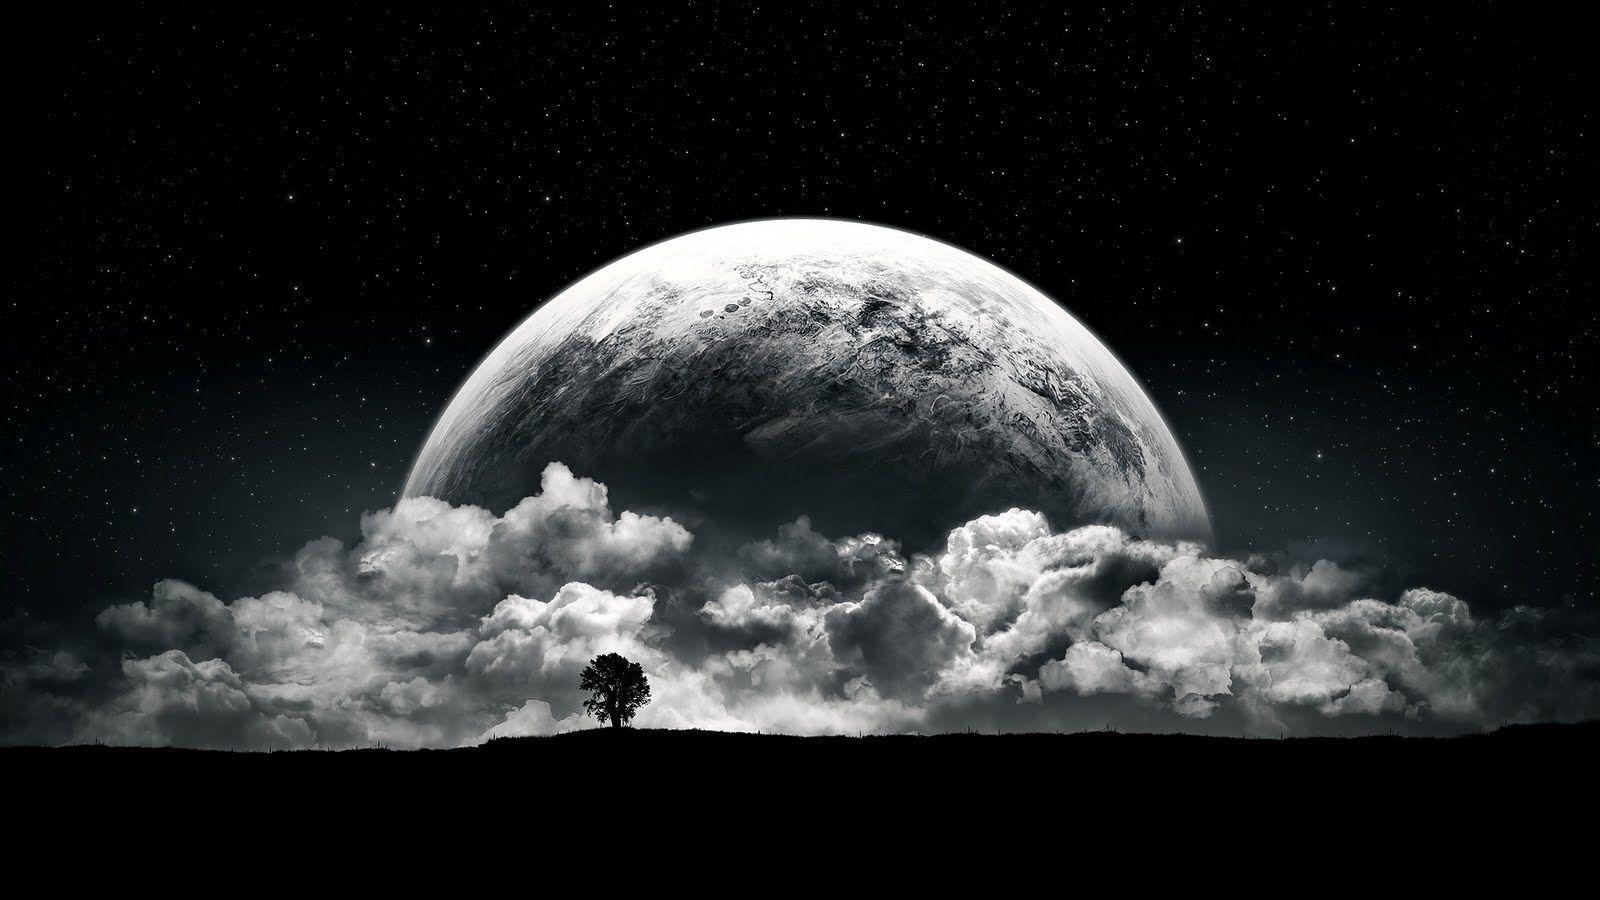 sonho preto e branco